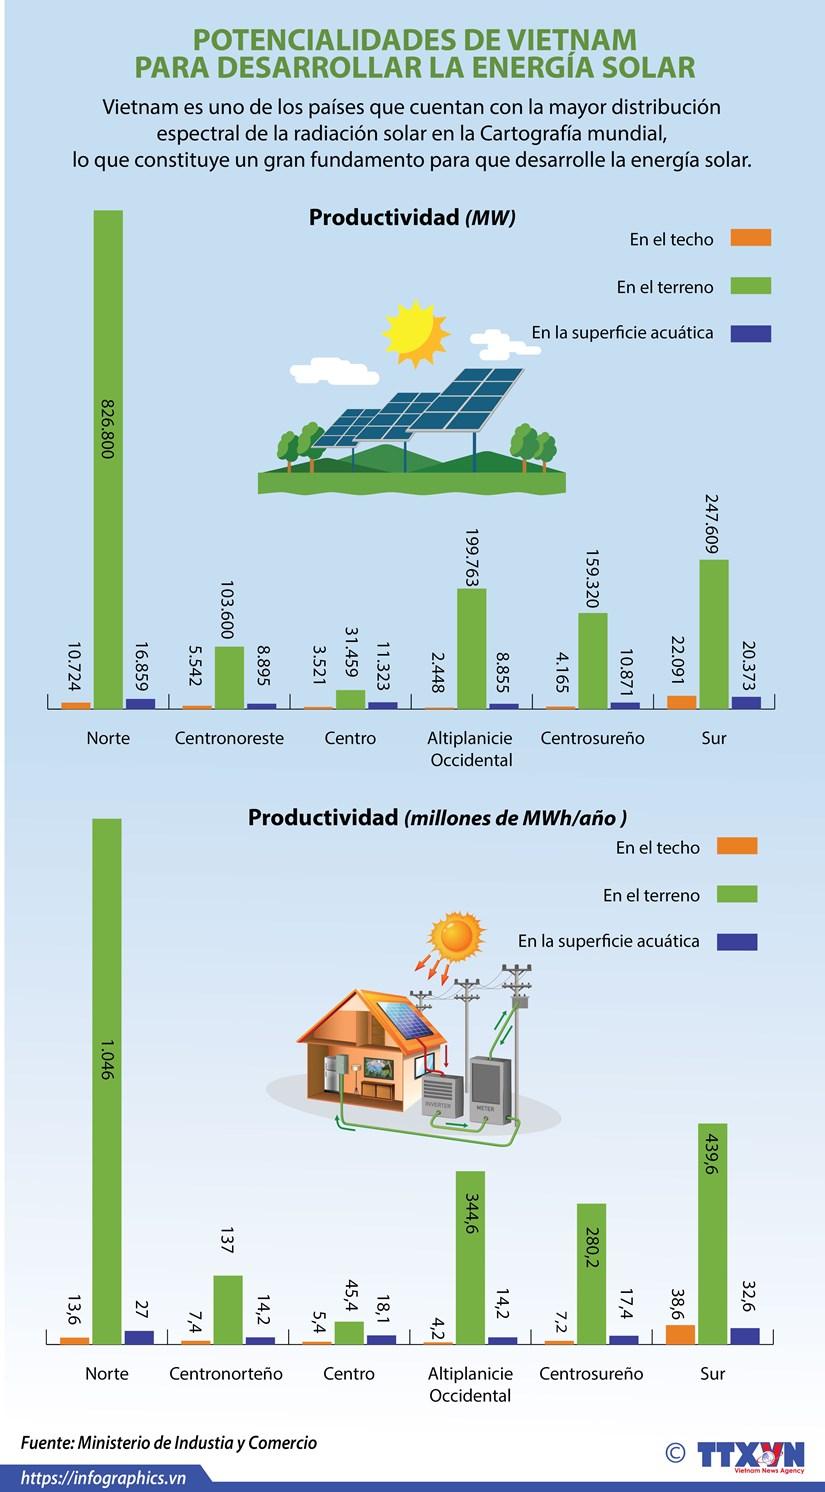 Vietnam posee potencialidades para desarrollar energia solar hinh anh 1